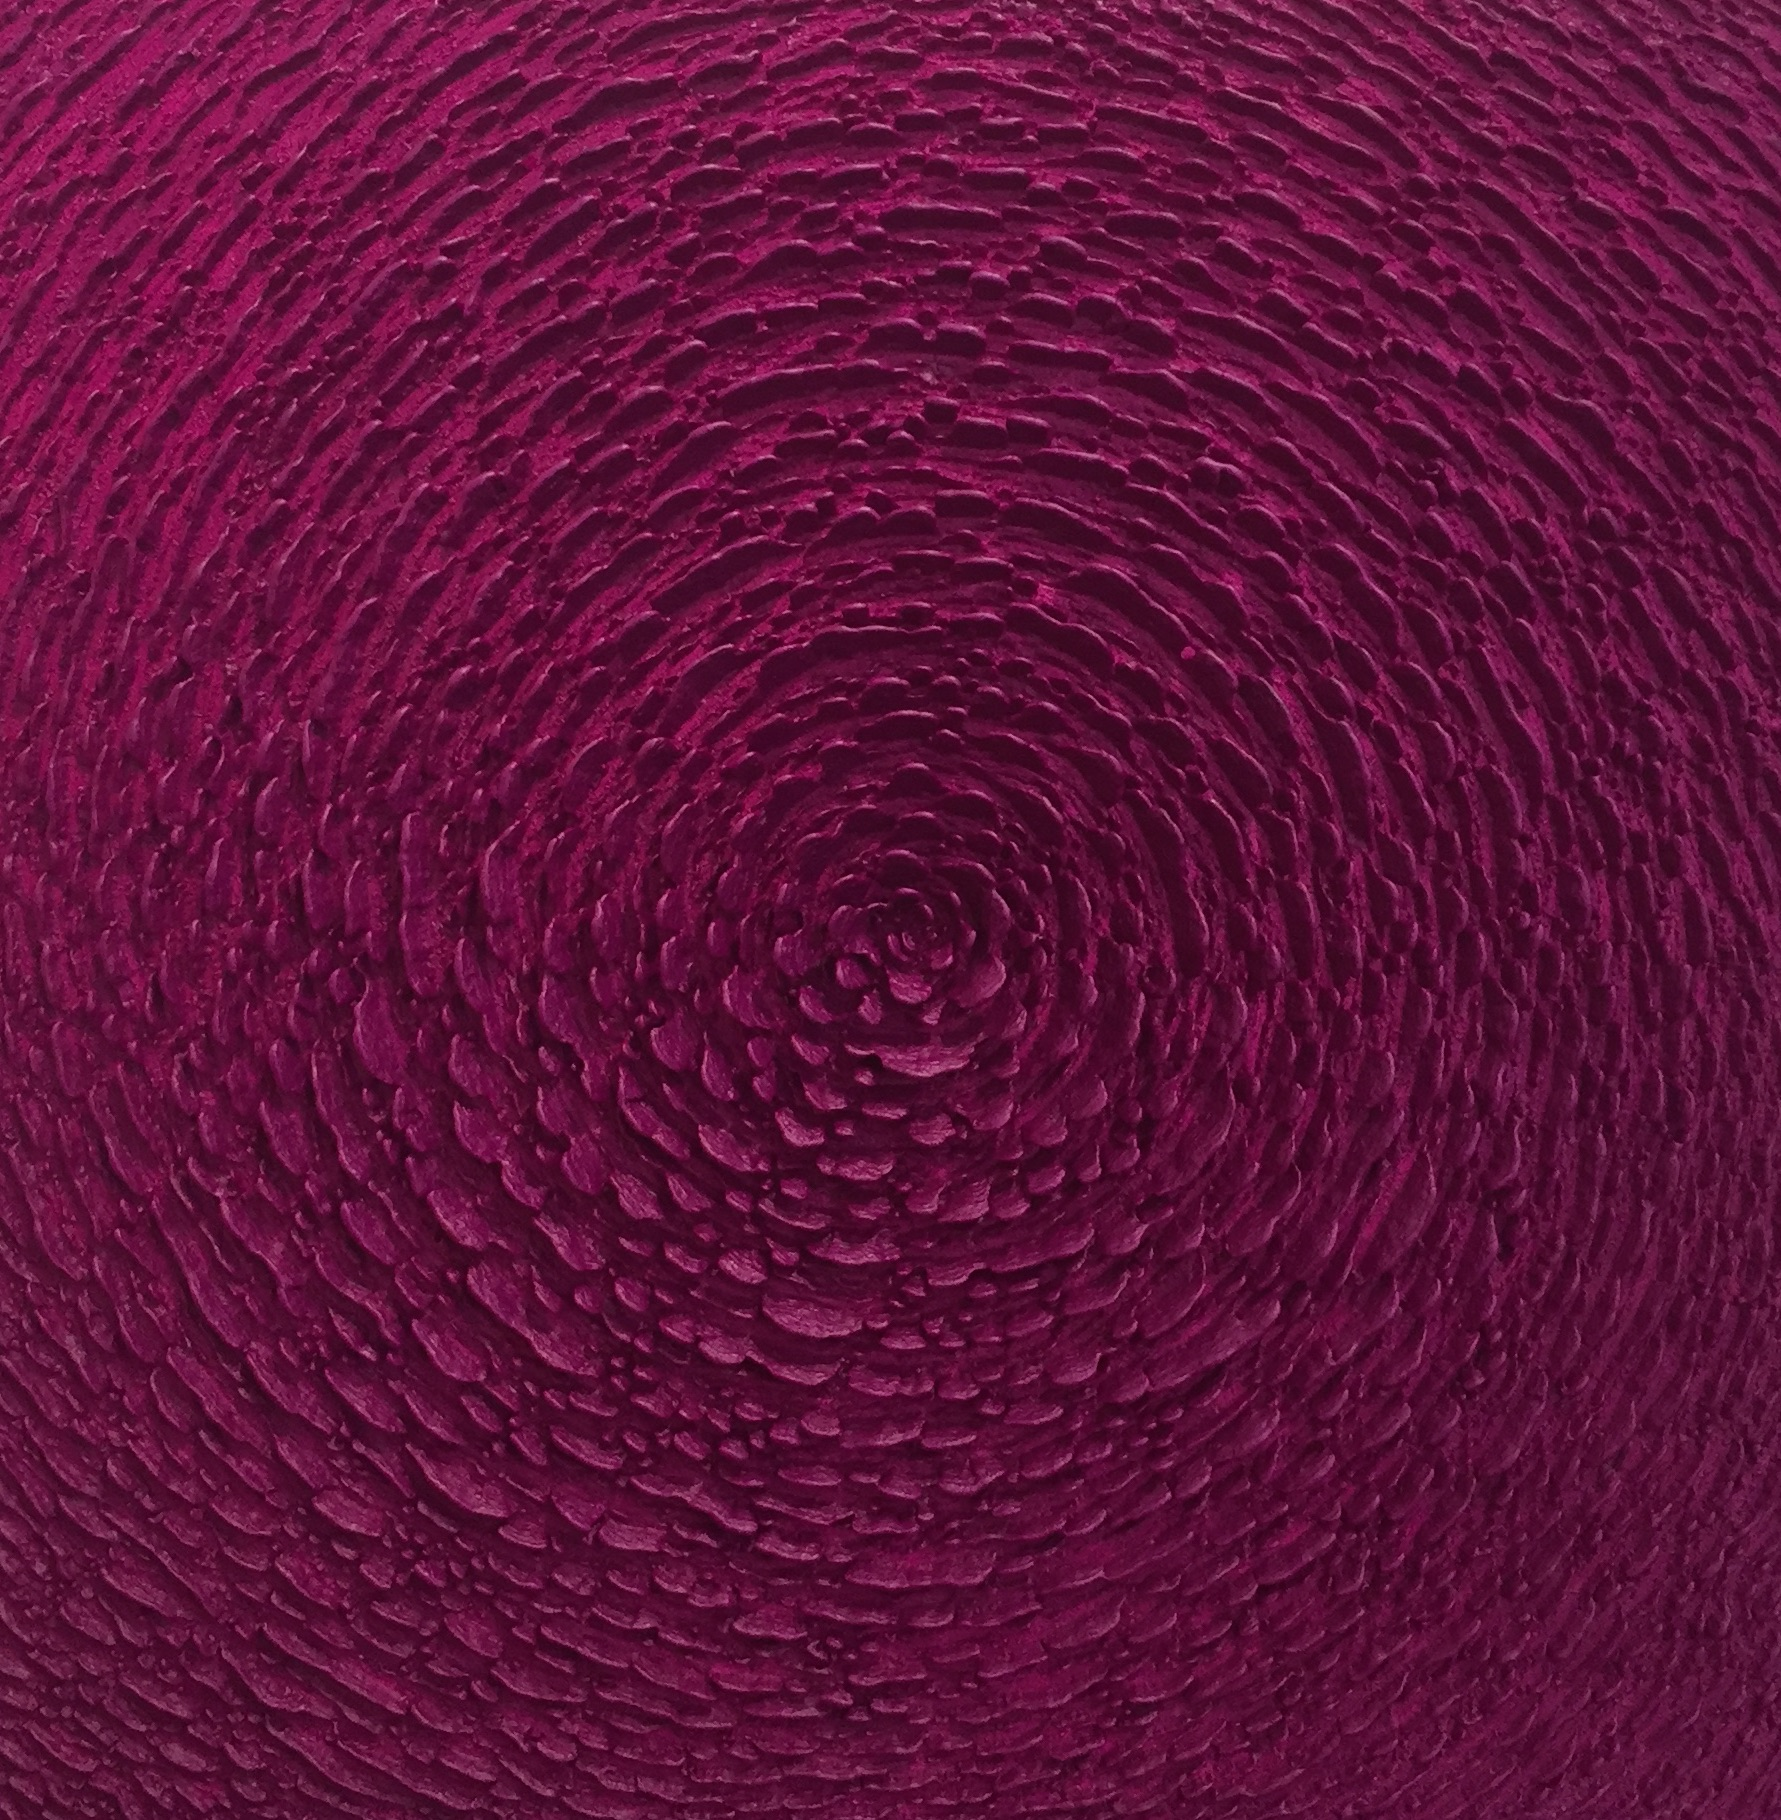 Martin Kline,  Cobalt Violet Bloom,  2017, encaustic on canvas, 36 x 36 x 3 1/2 inches